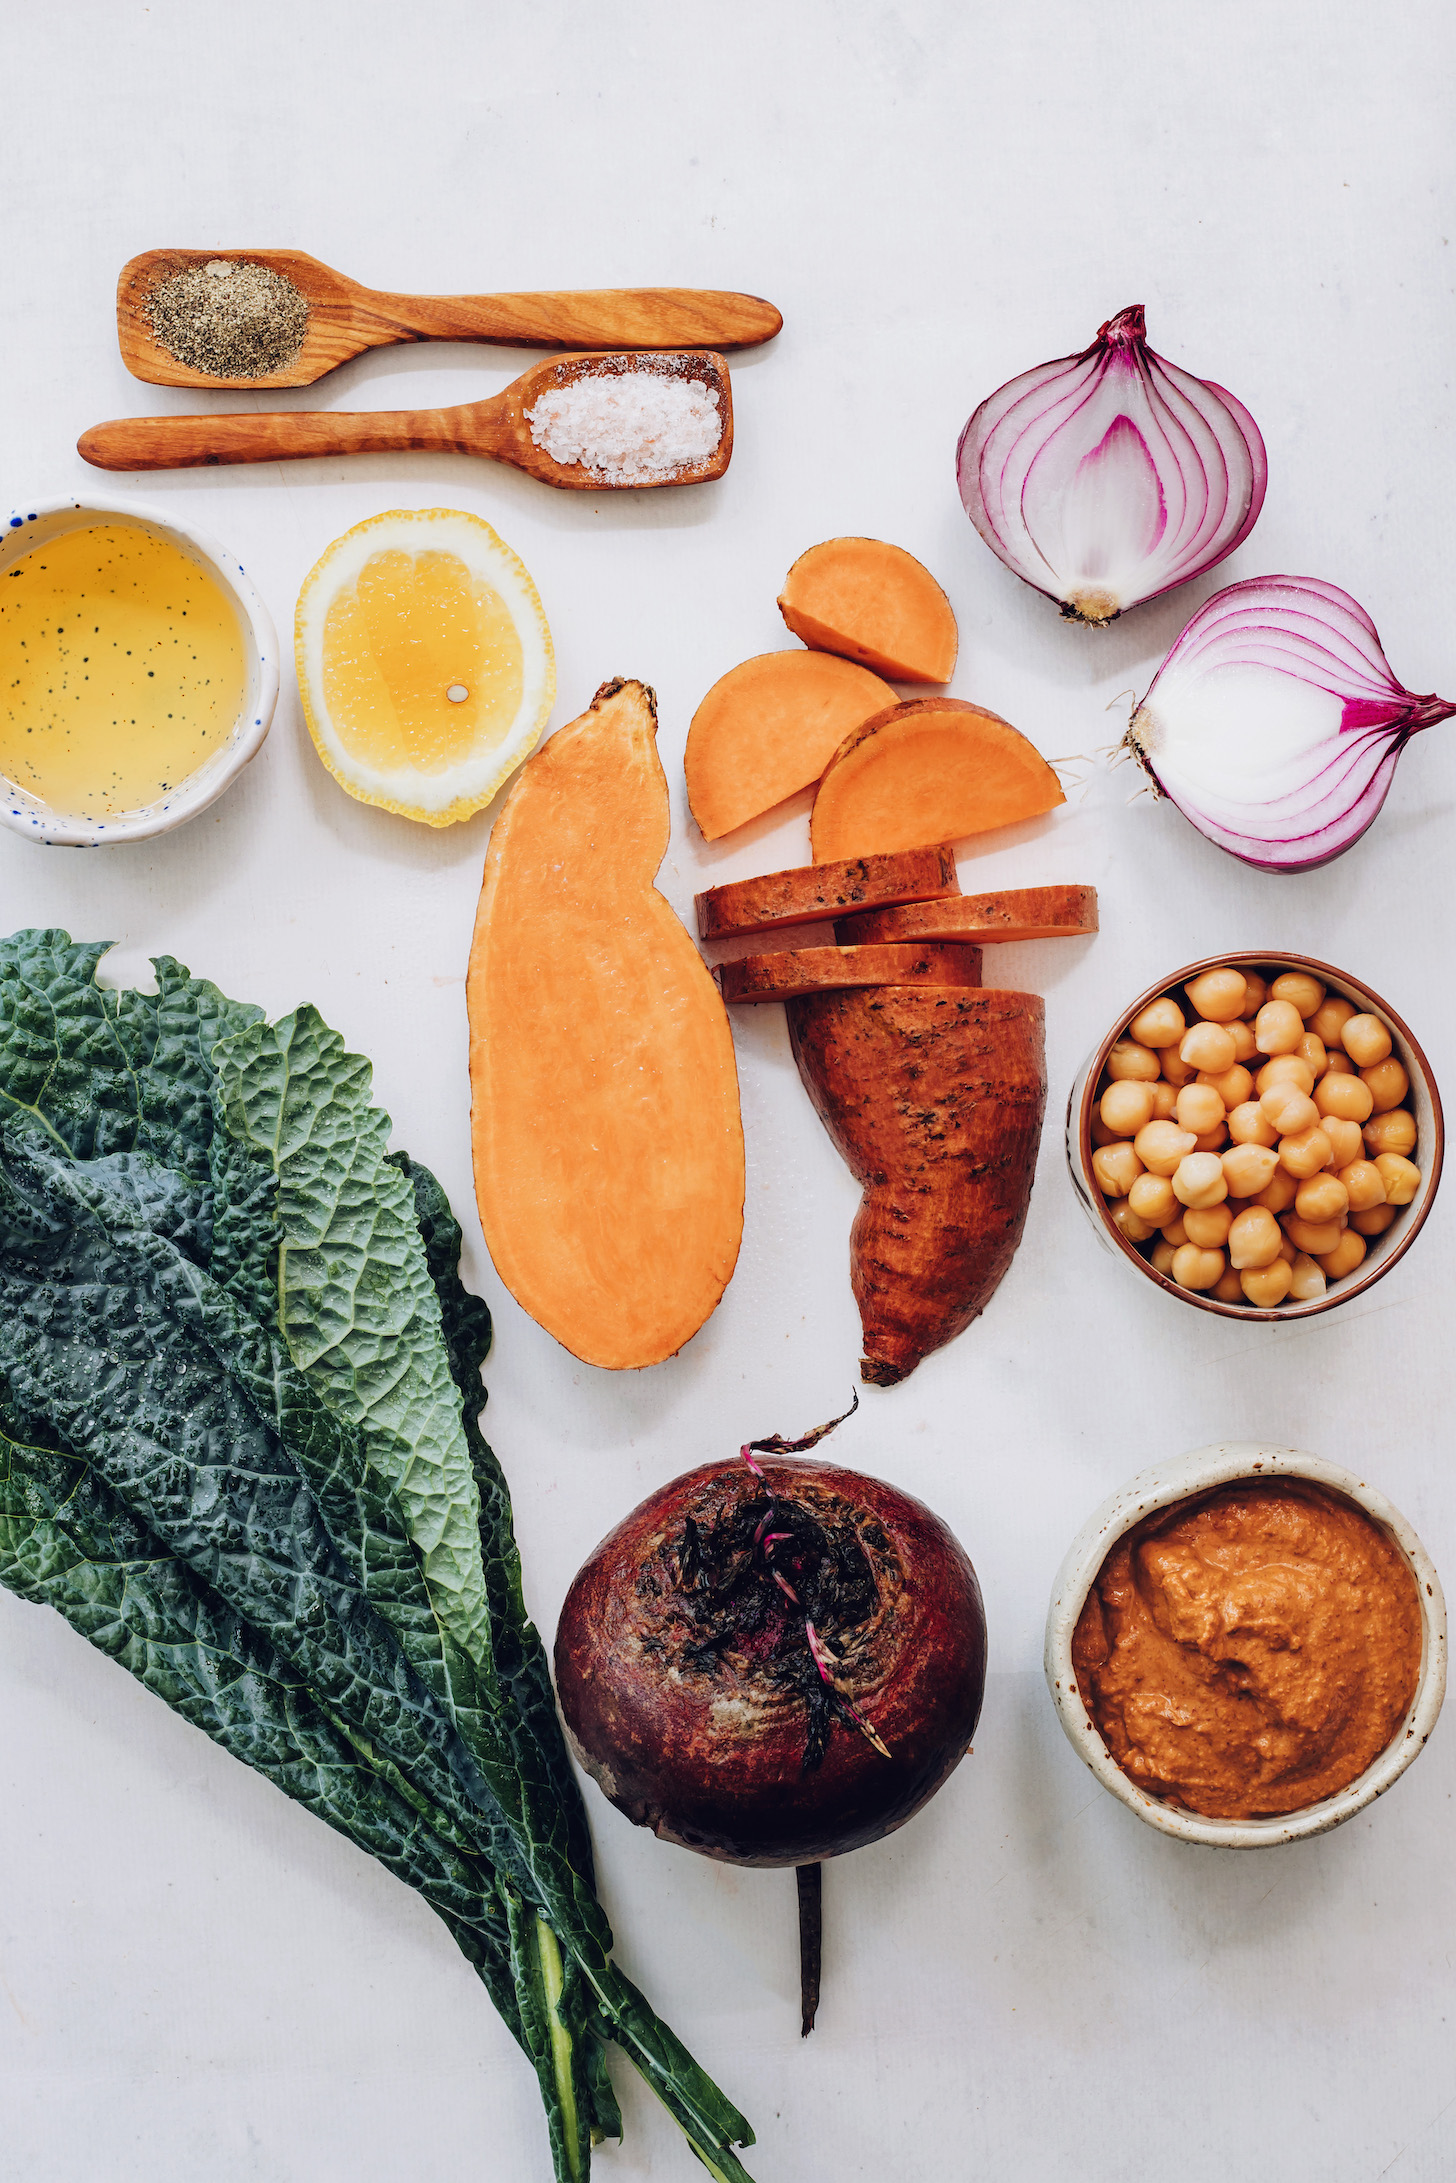 Kale, beet, sweet potato, chickpeas, chipotle pecan pesto, red onion, lemon, salt, and olive oil